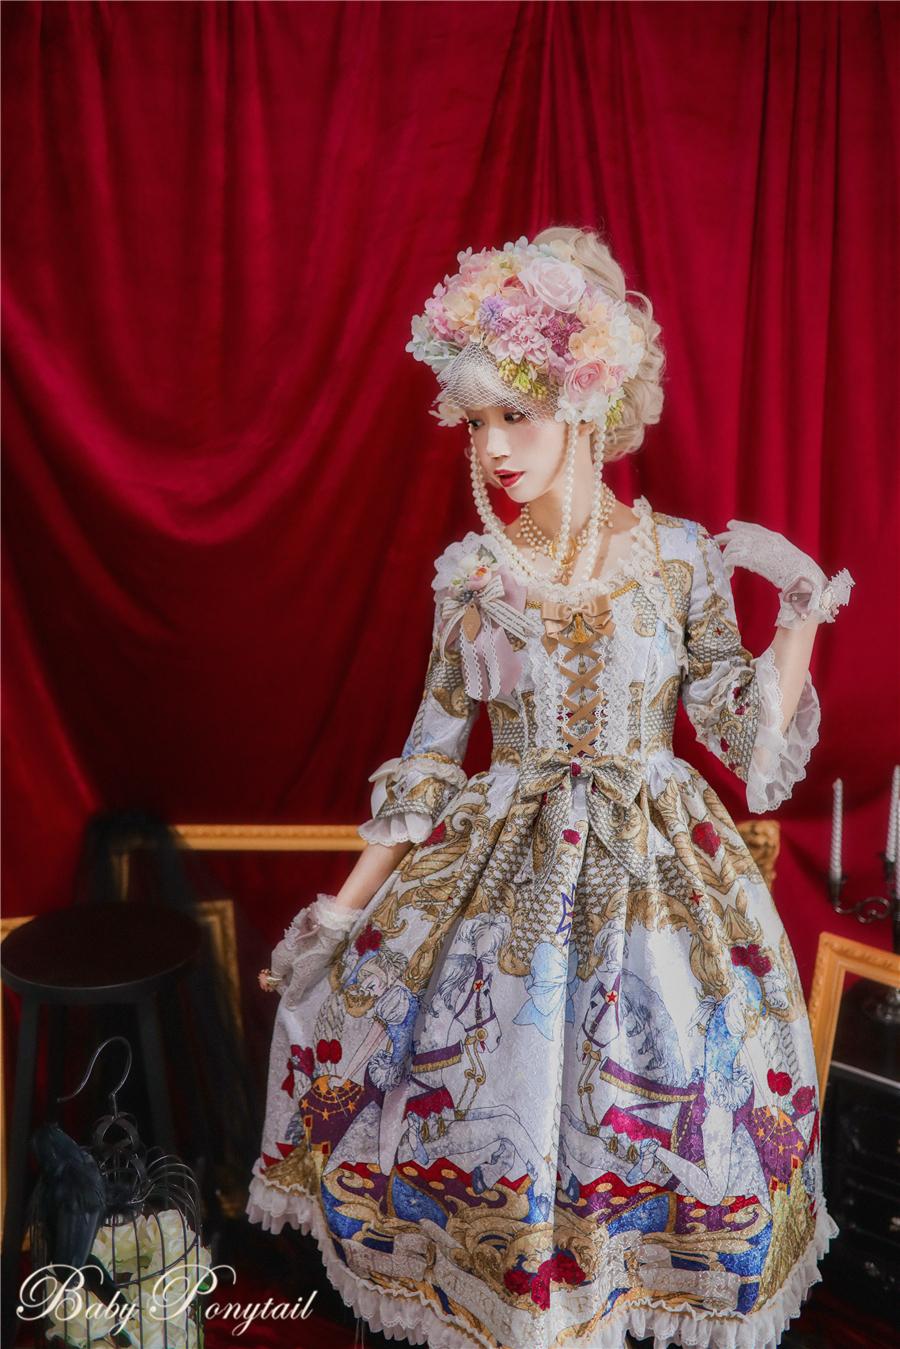 Baby Ponytail_Circus Princess_Silver OP_Kaka_13.jpg